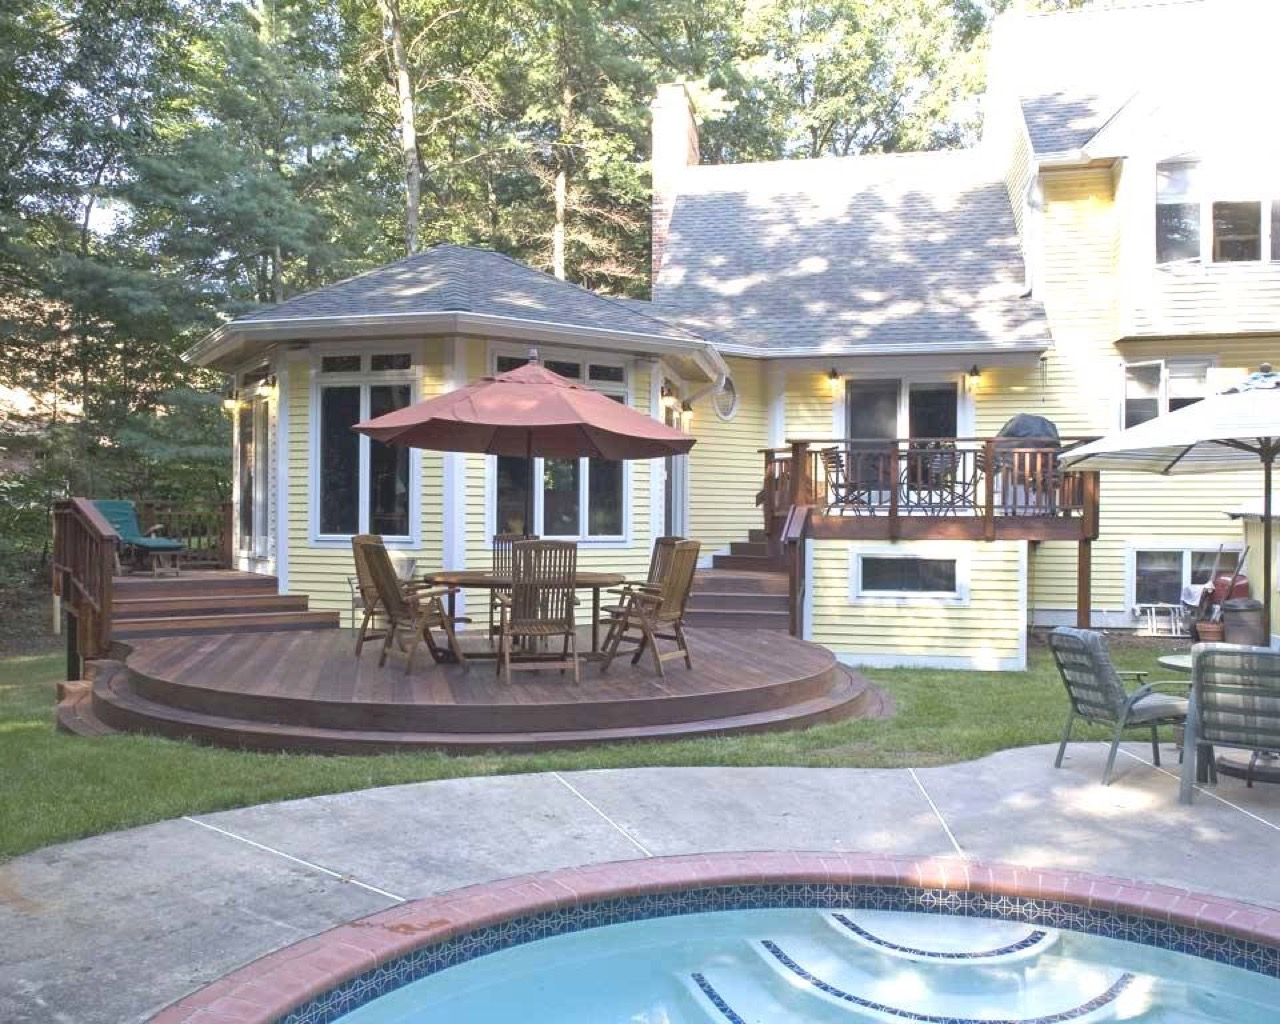 Deck, Pergola, and Porch Designs for Pools